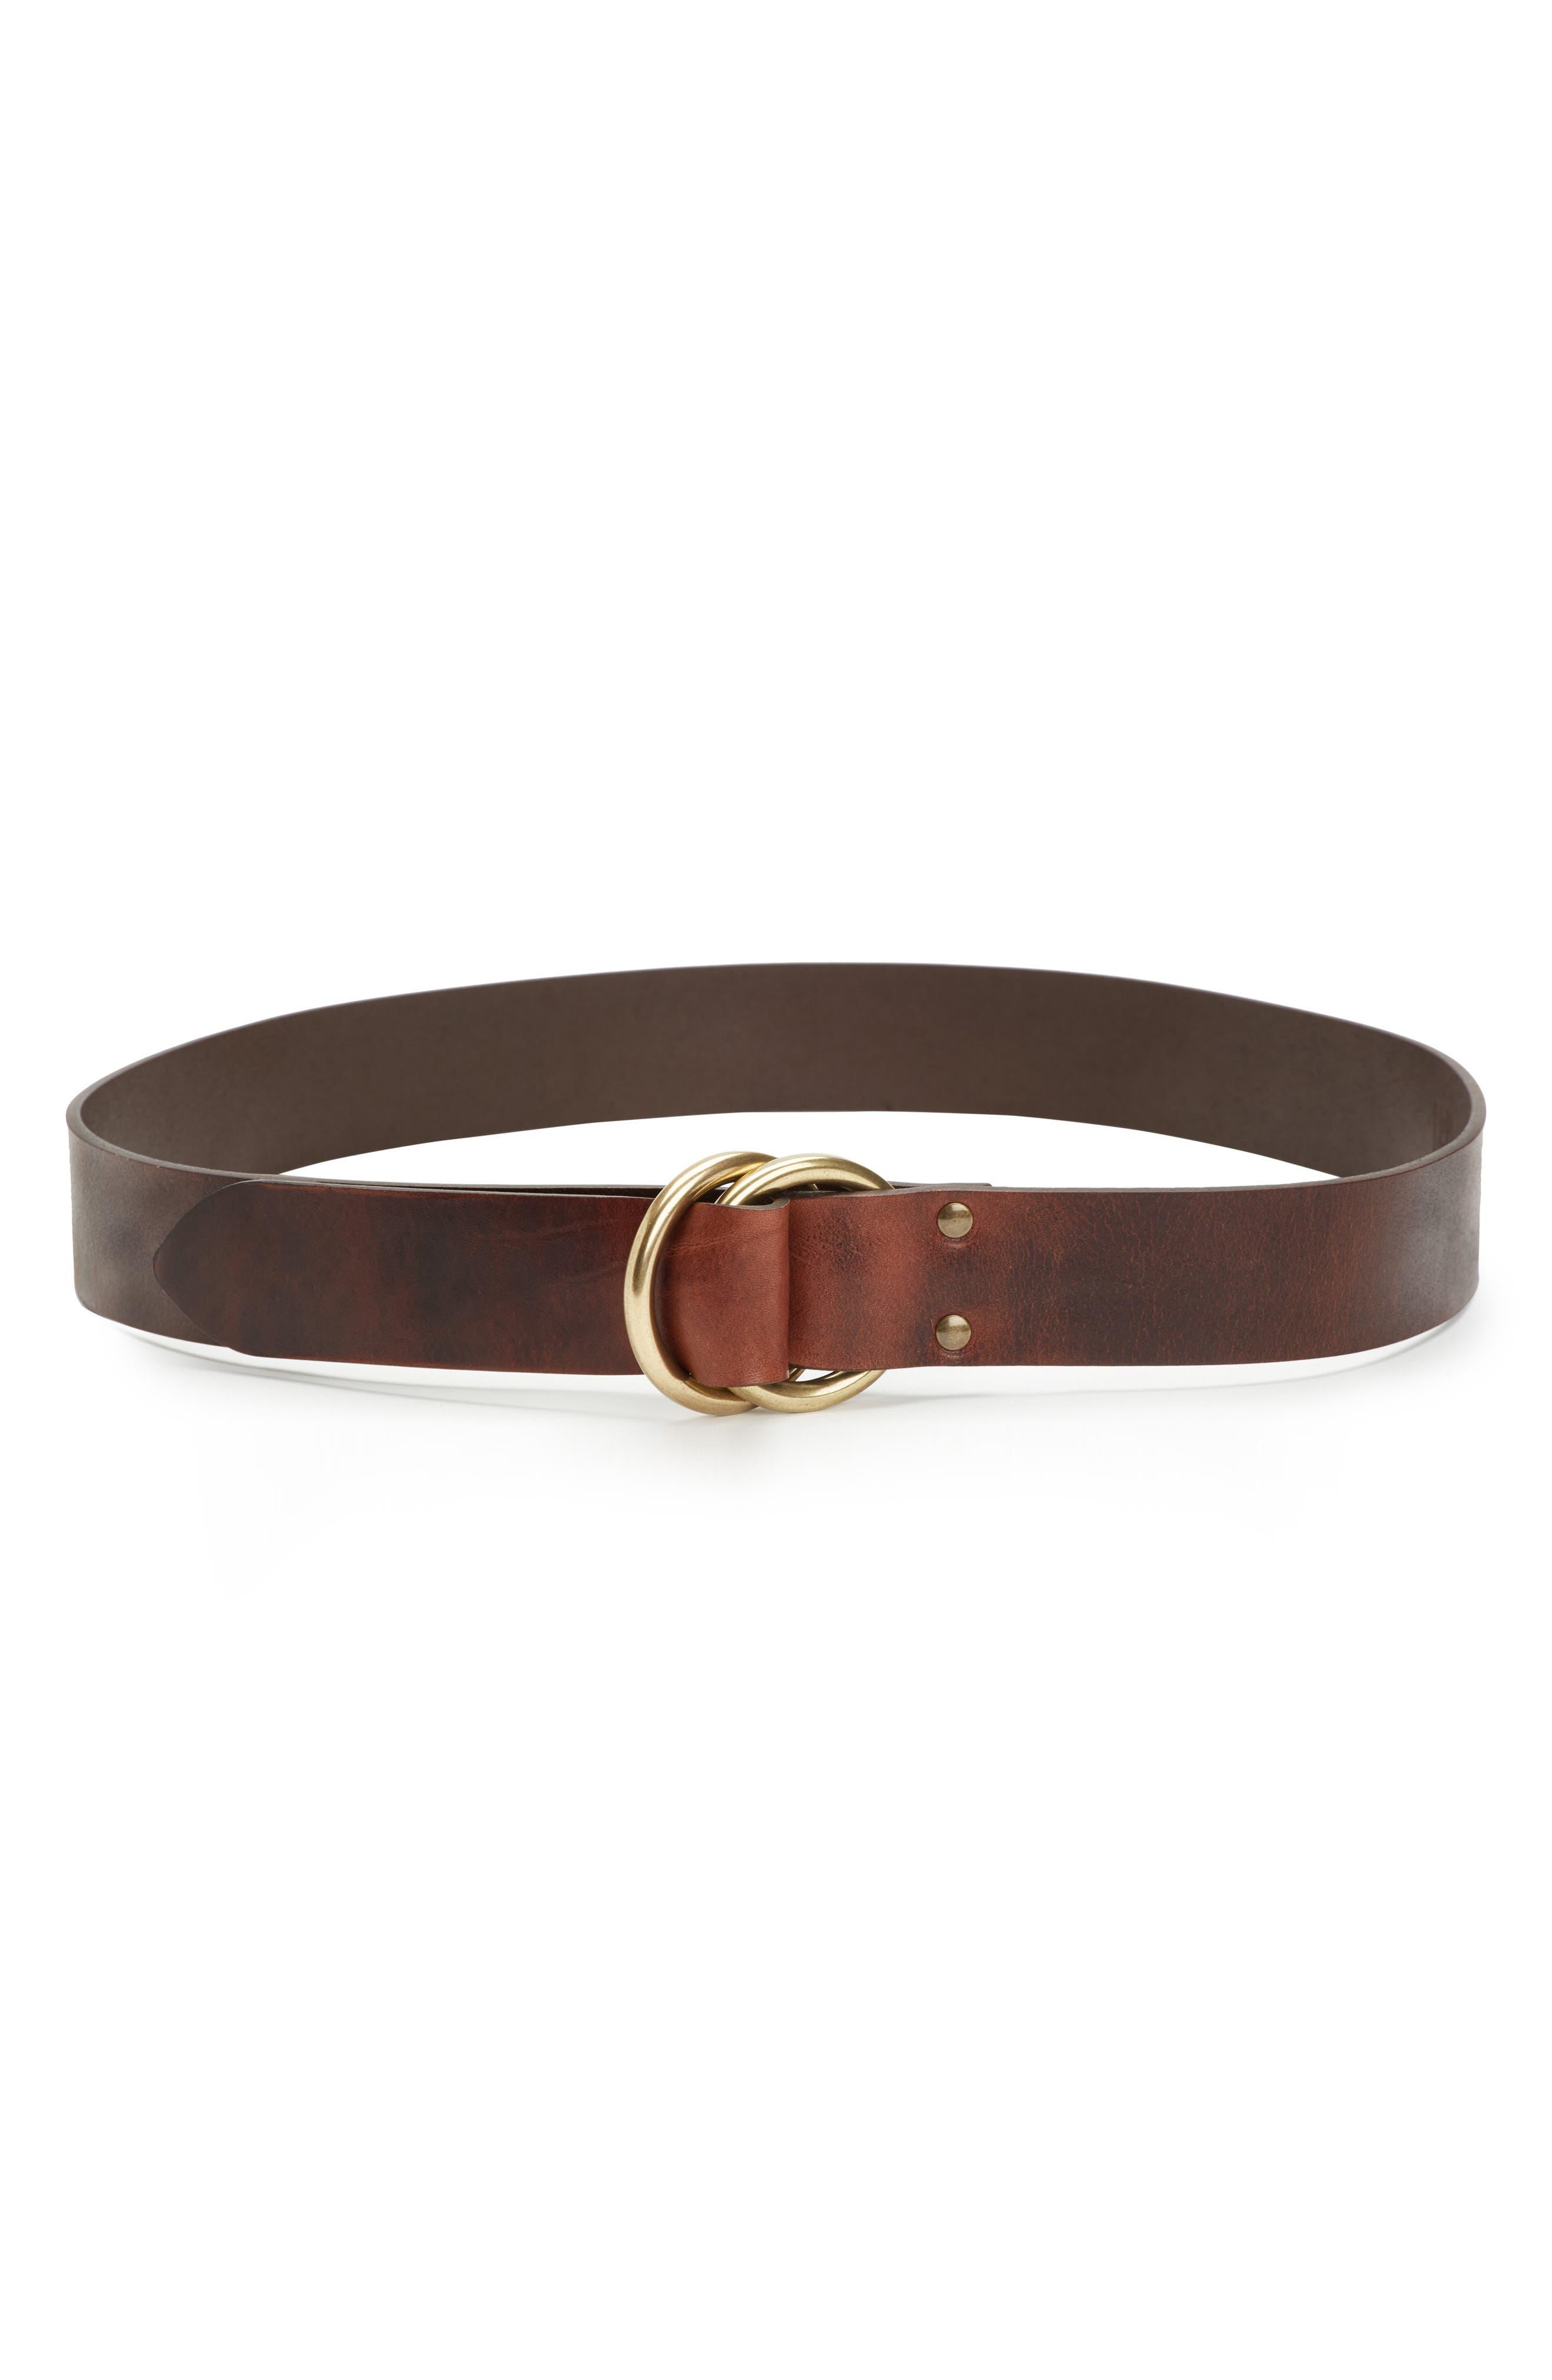 Alternate Image 1 Selected - Frye Harness Leather Belt